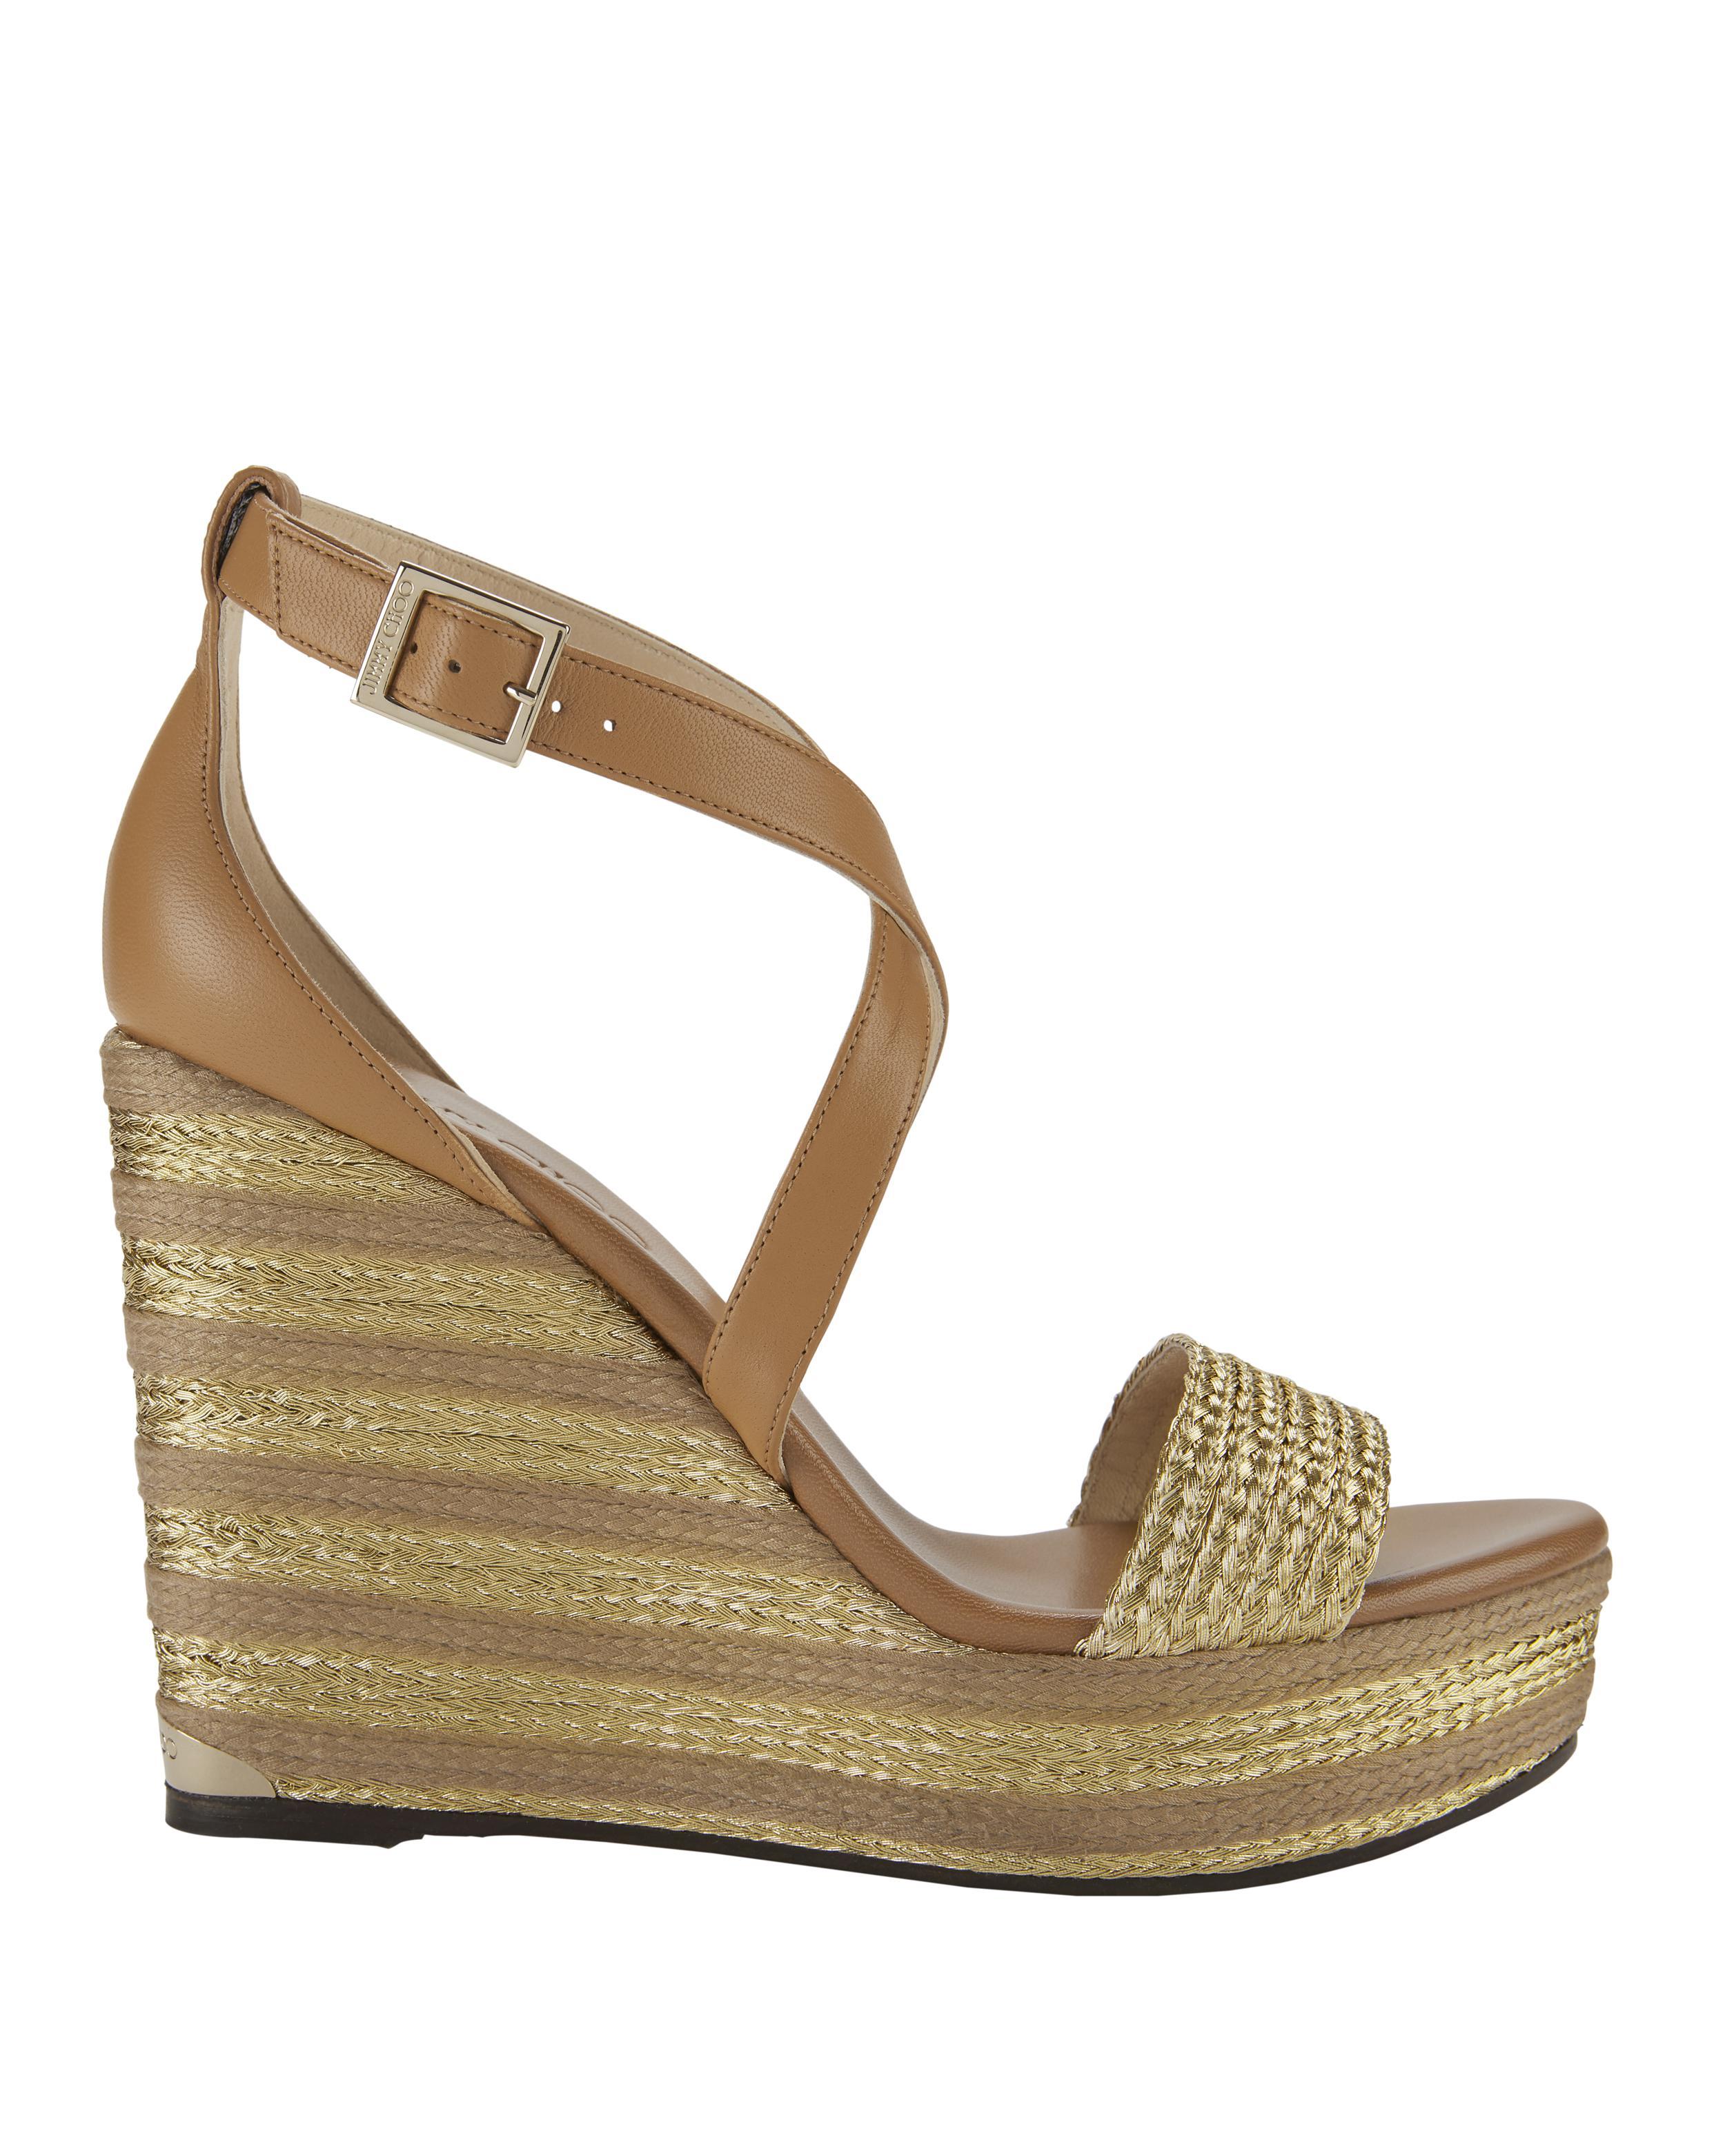 c5a0b42da246 Lyst - Jimmy Choo Portia Metallic Stripe Wedge Sandals in Brown